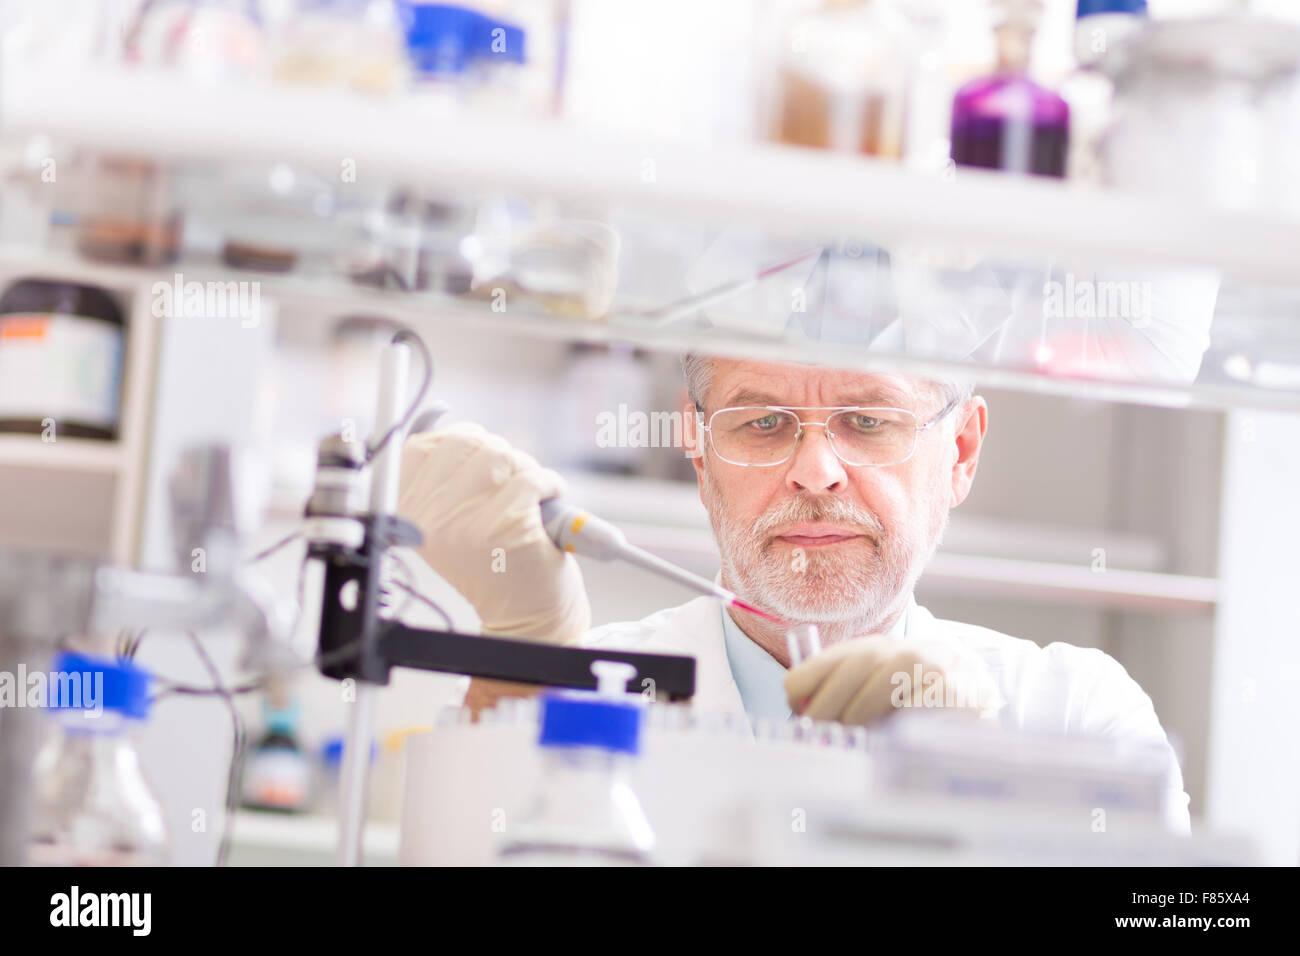 Lebens-Wissenschaftler forschen im Labor. Stockbild